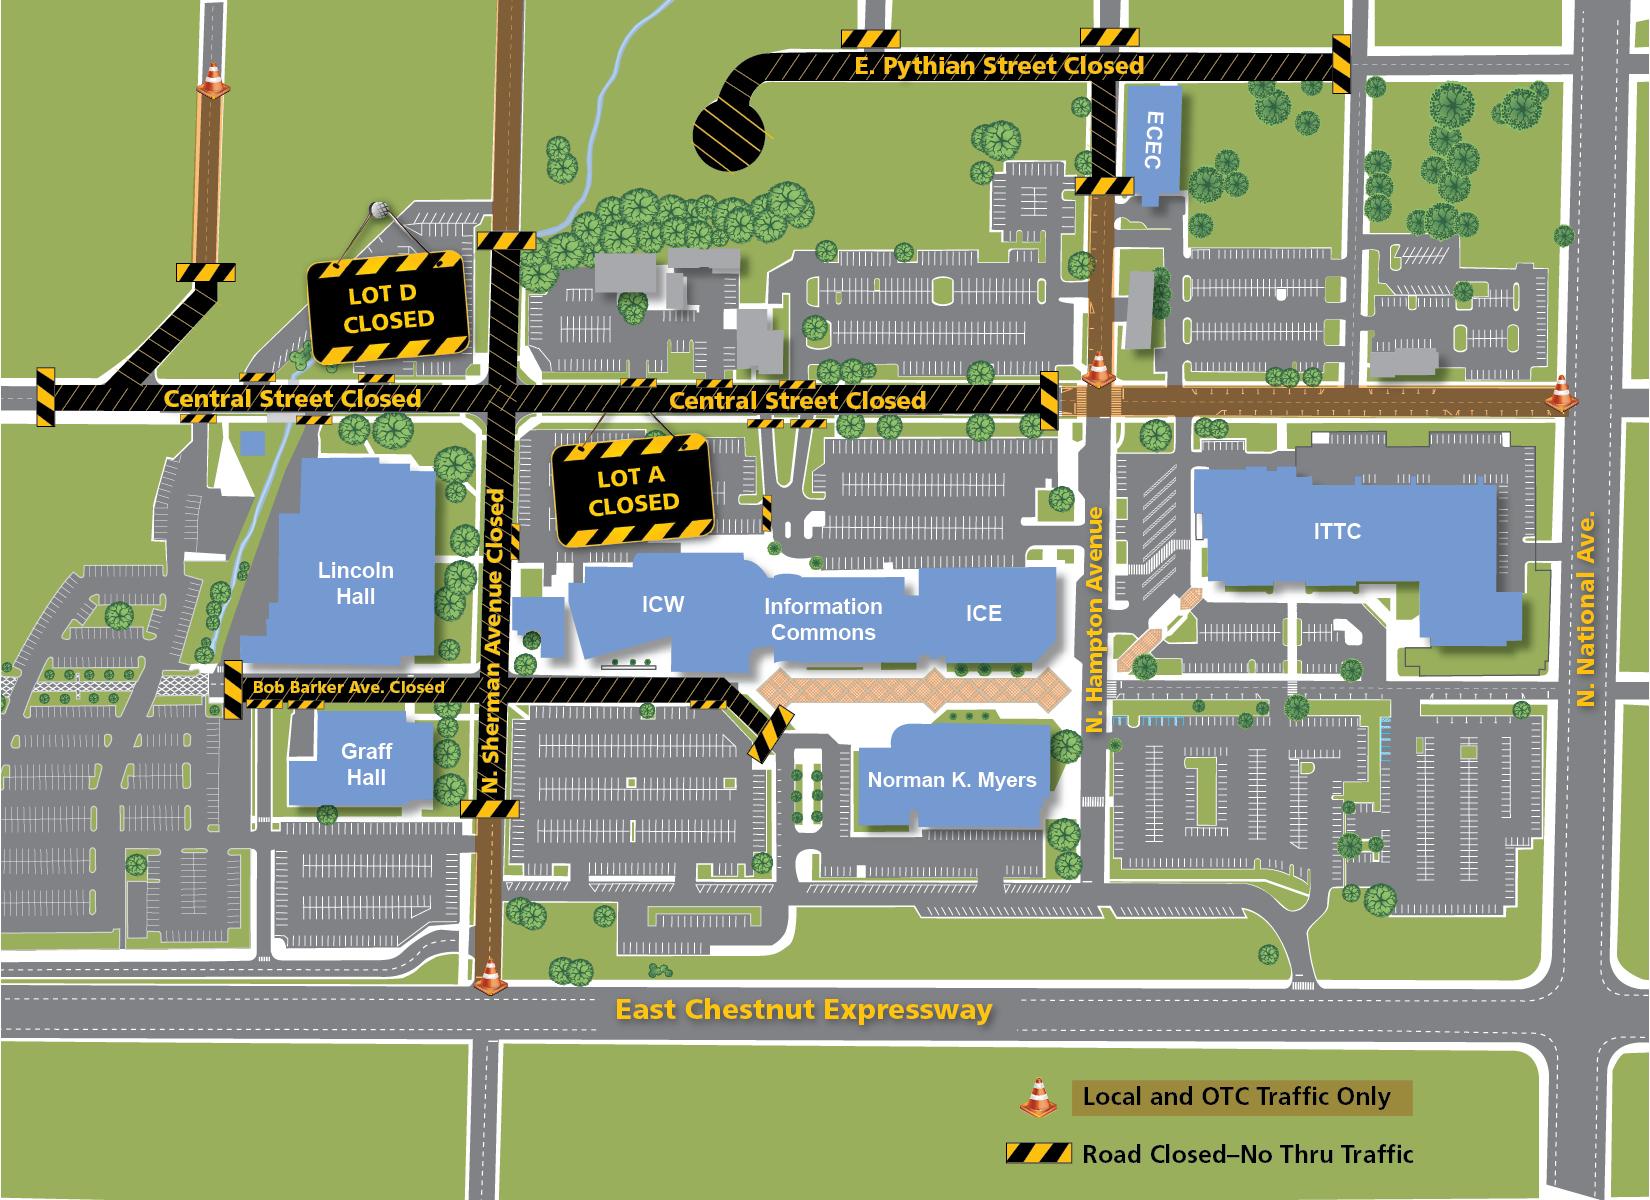 Parking Lot Closure Map(6-29-16)